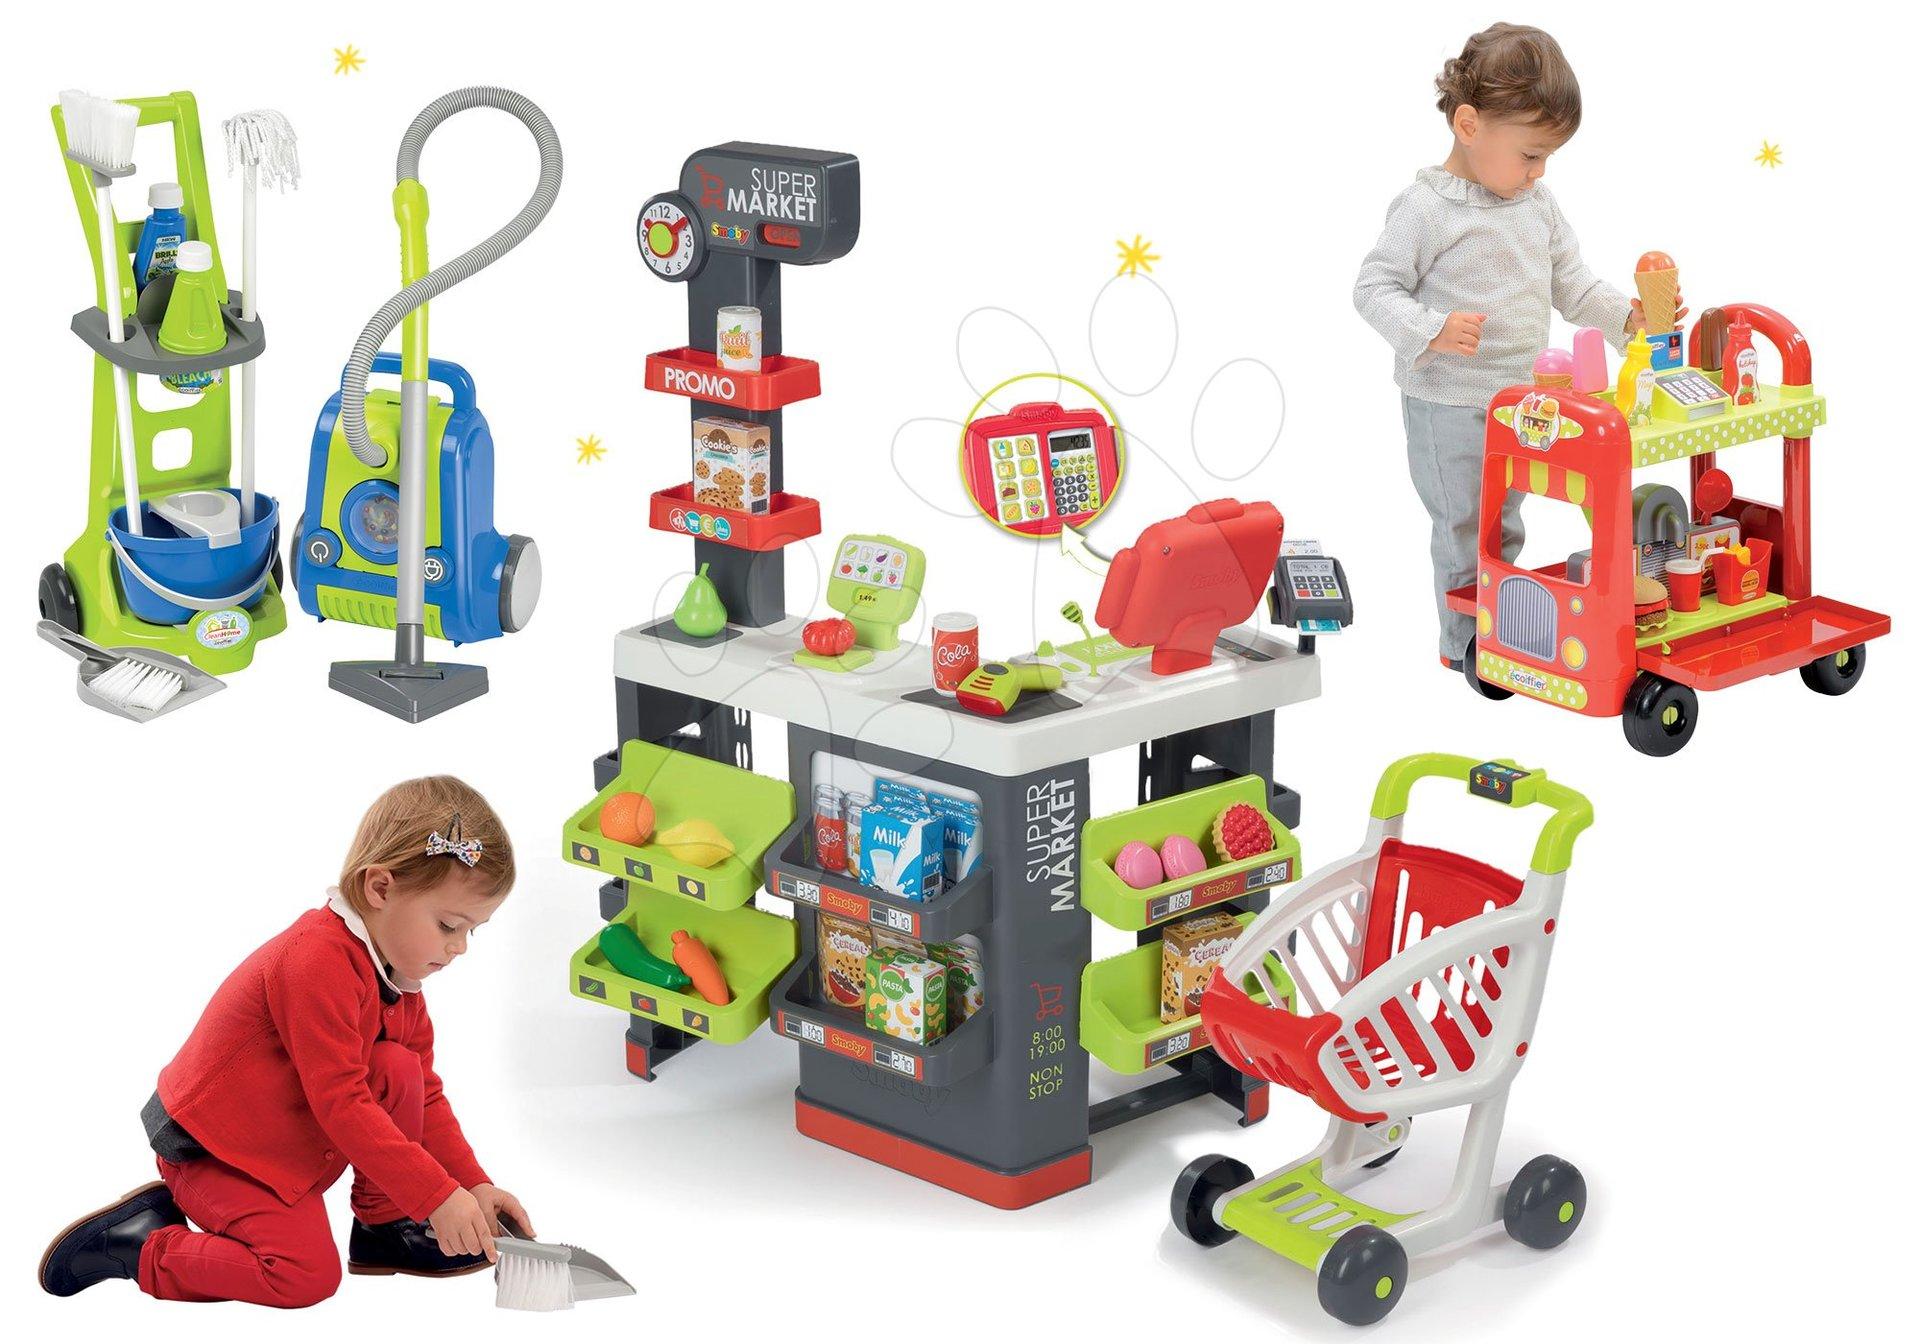 Obchody pre deti sety - Set obchod Supermarket Smoby s elektronickou pokladňou a vozík so zmrzlinou a upratovací set